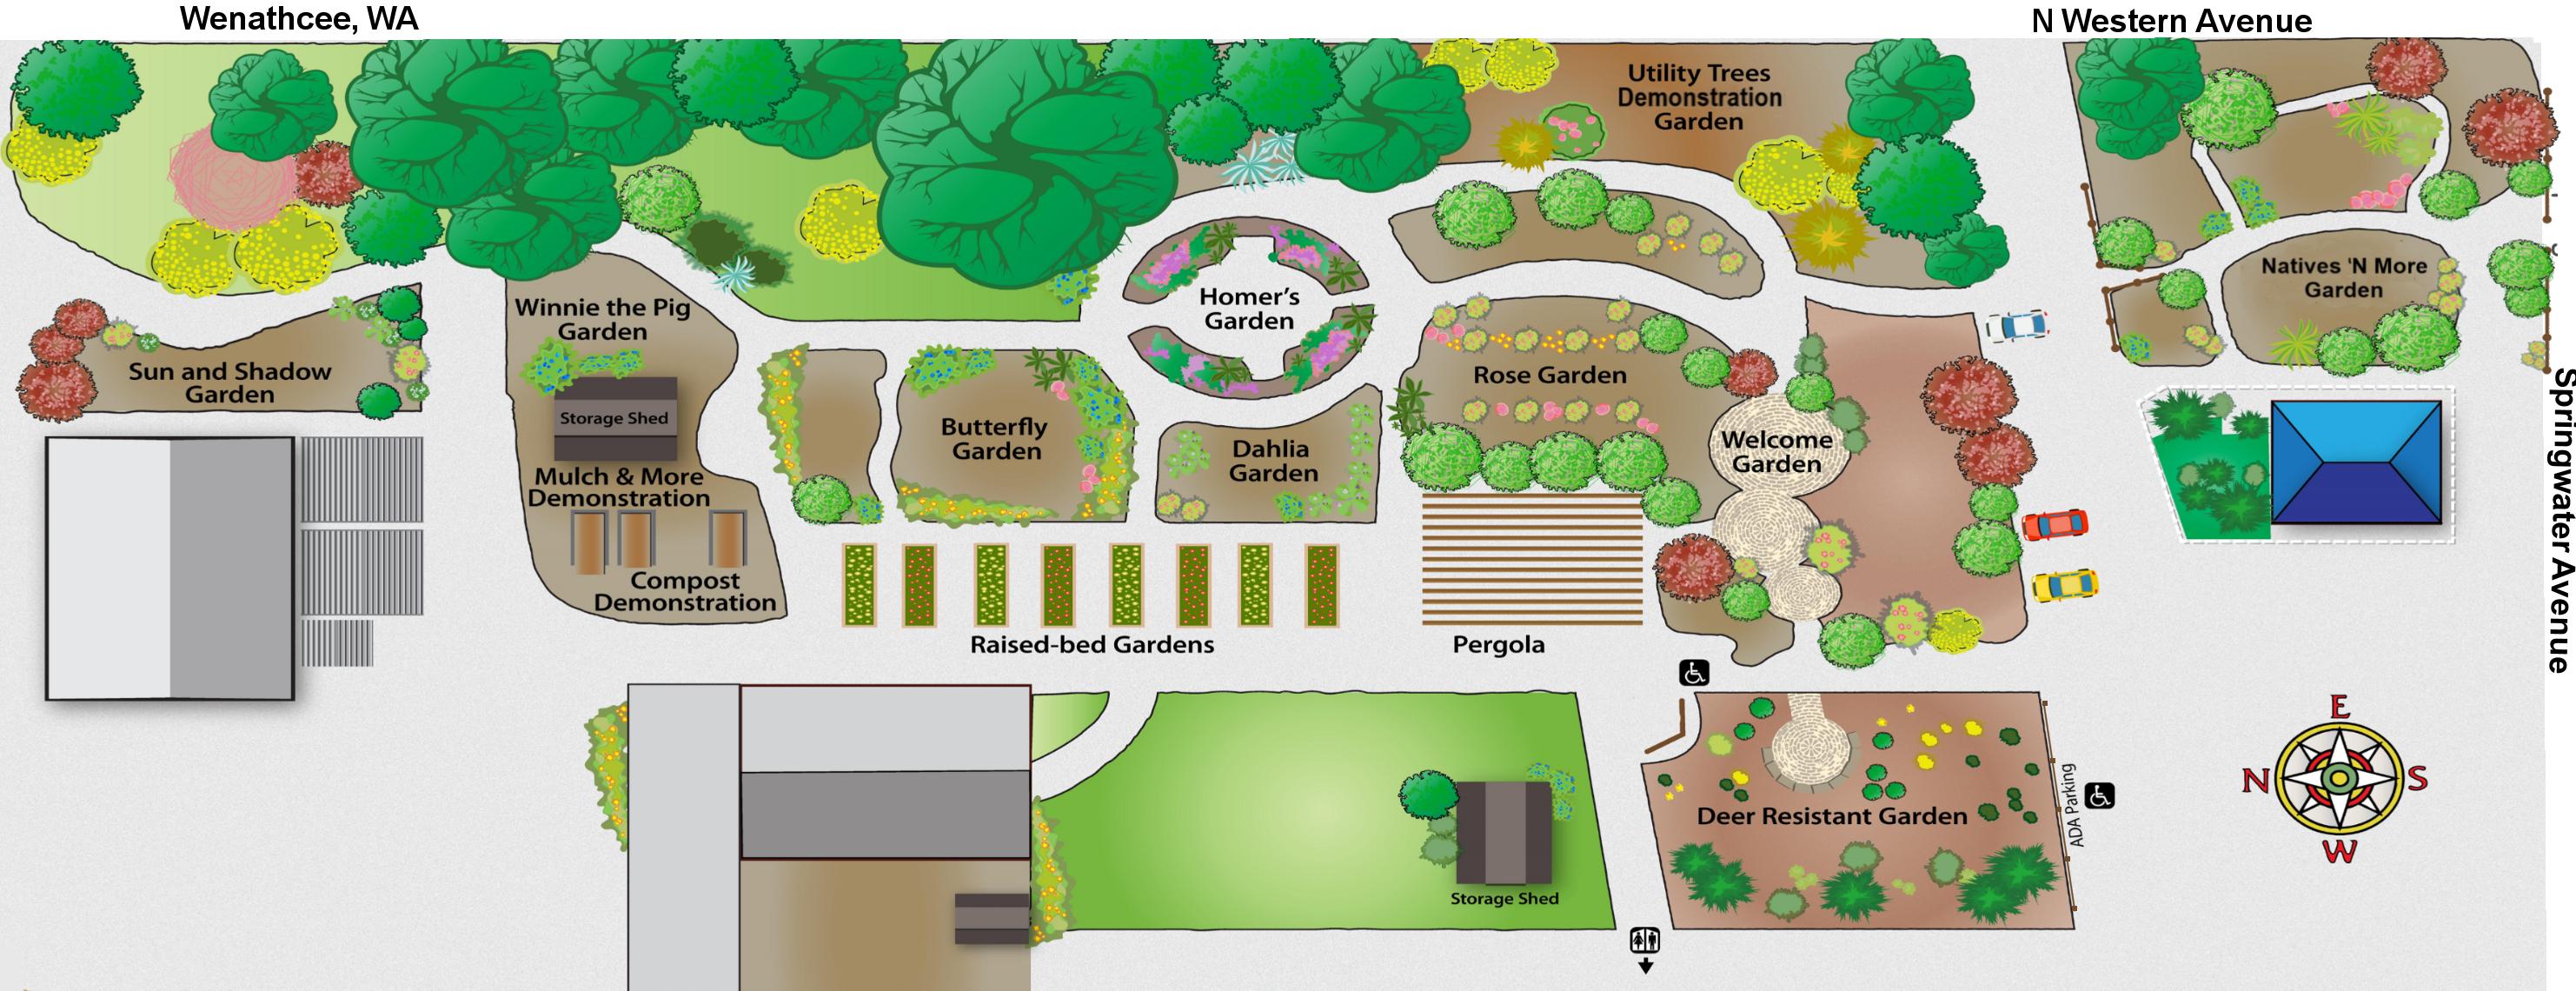 Community Education Garden map